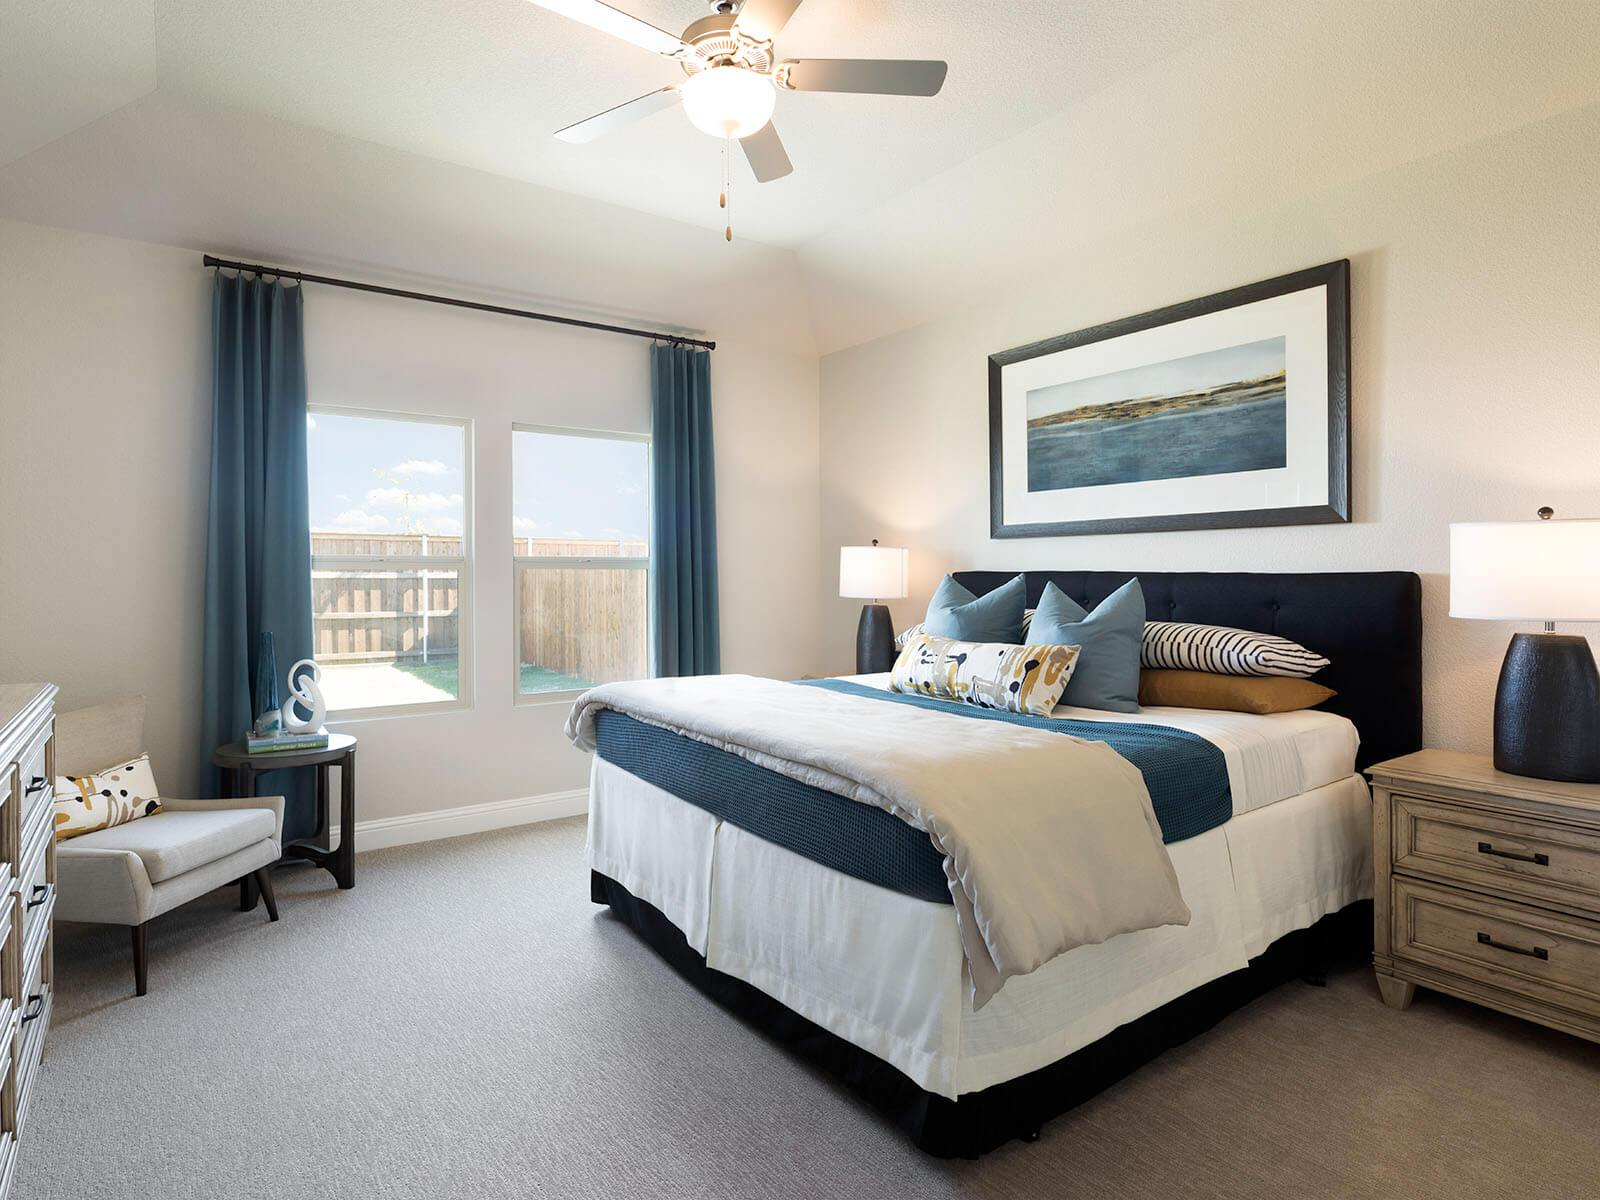 Bedroom featured in The Kessler By Meritage Homes in Dallas, TX